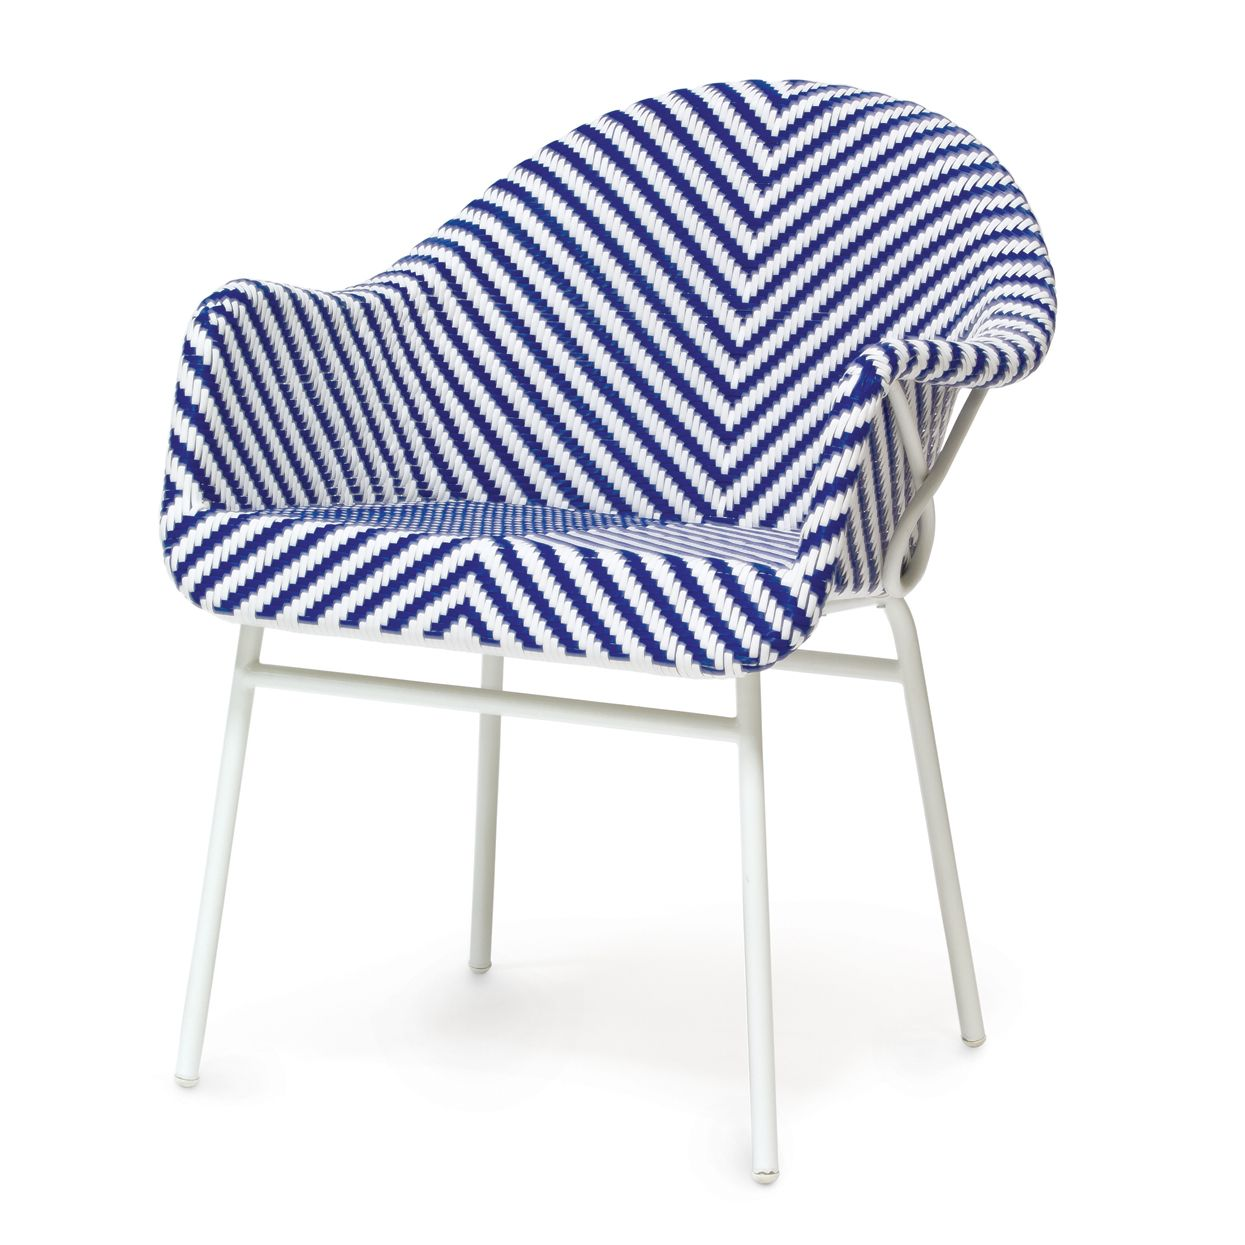 Blue and White Garden Arm Chair - Mecox Gardens  Outdoor armchair